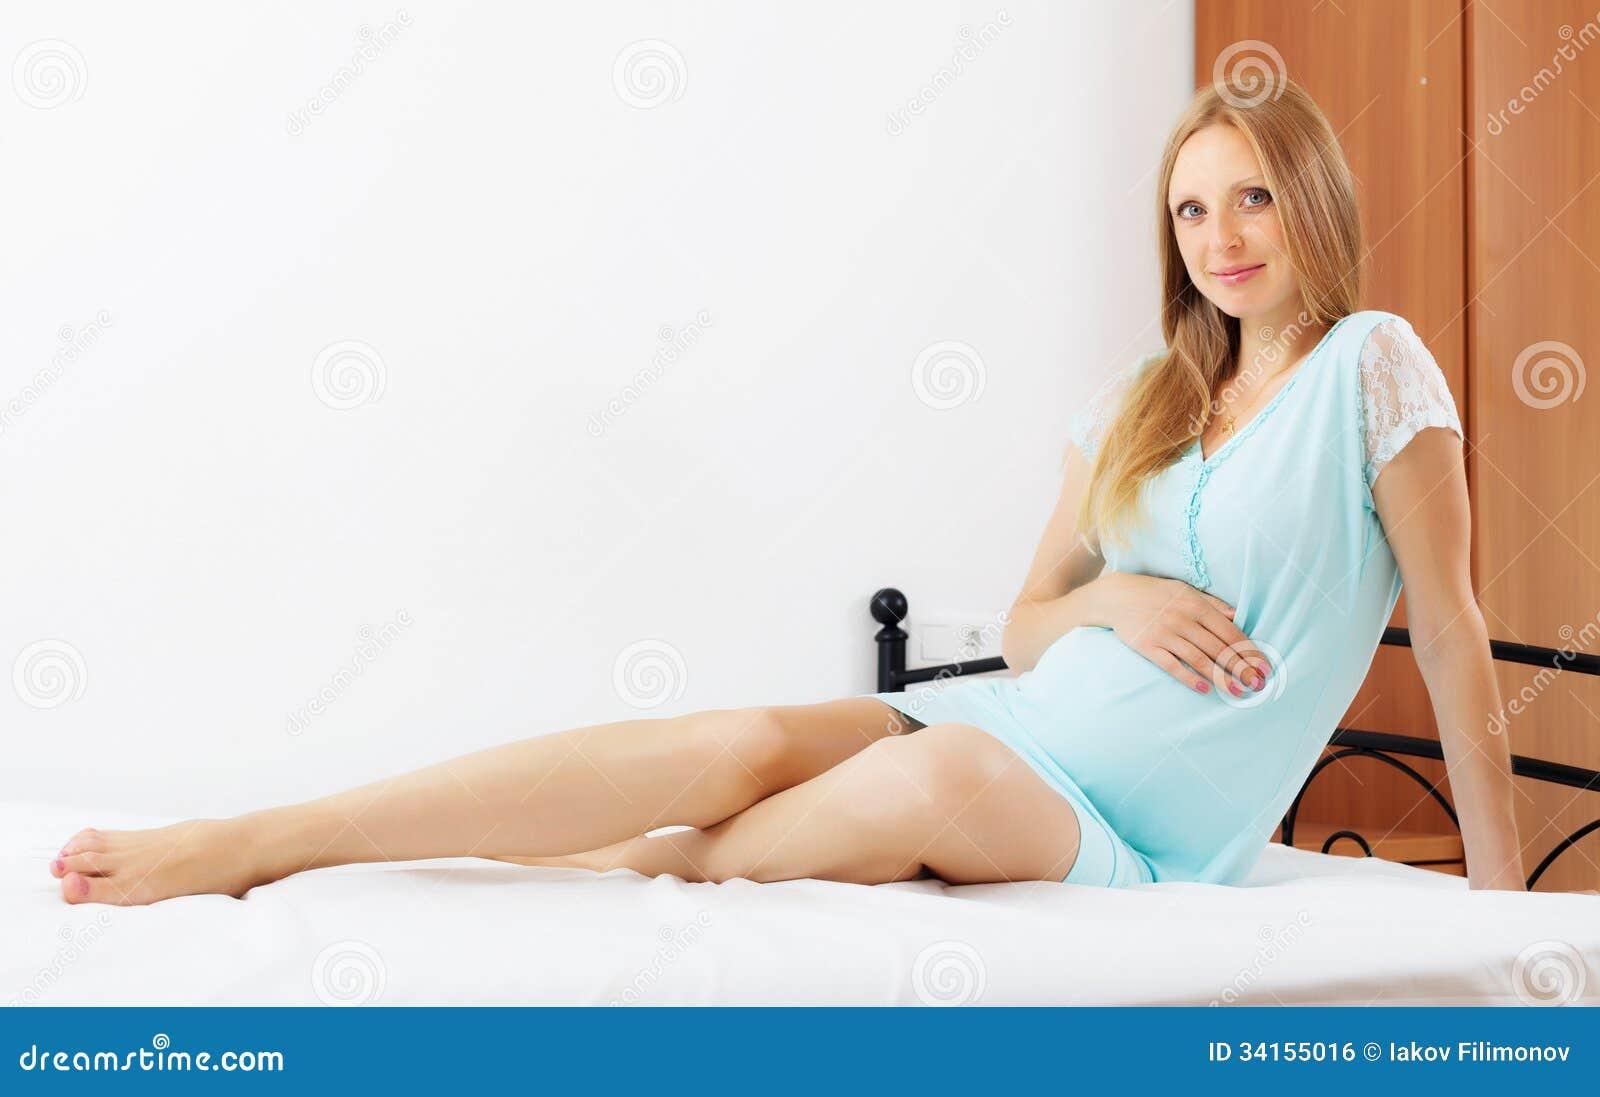 ... Sitting On White Sheet Royalty Free Stock Image - Image: 34155016